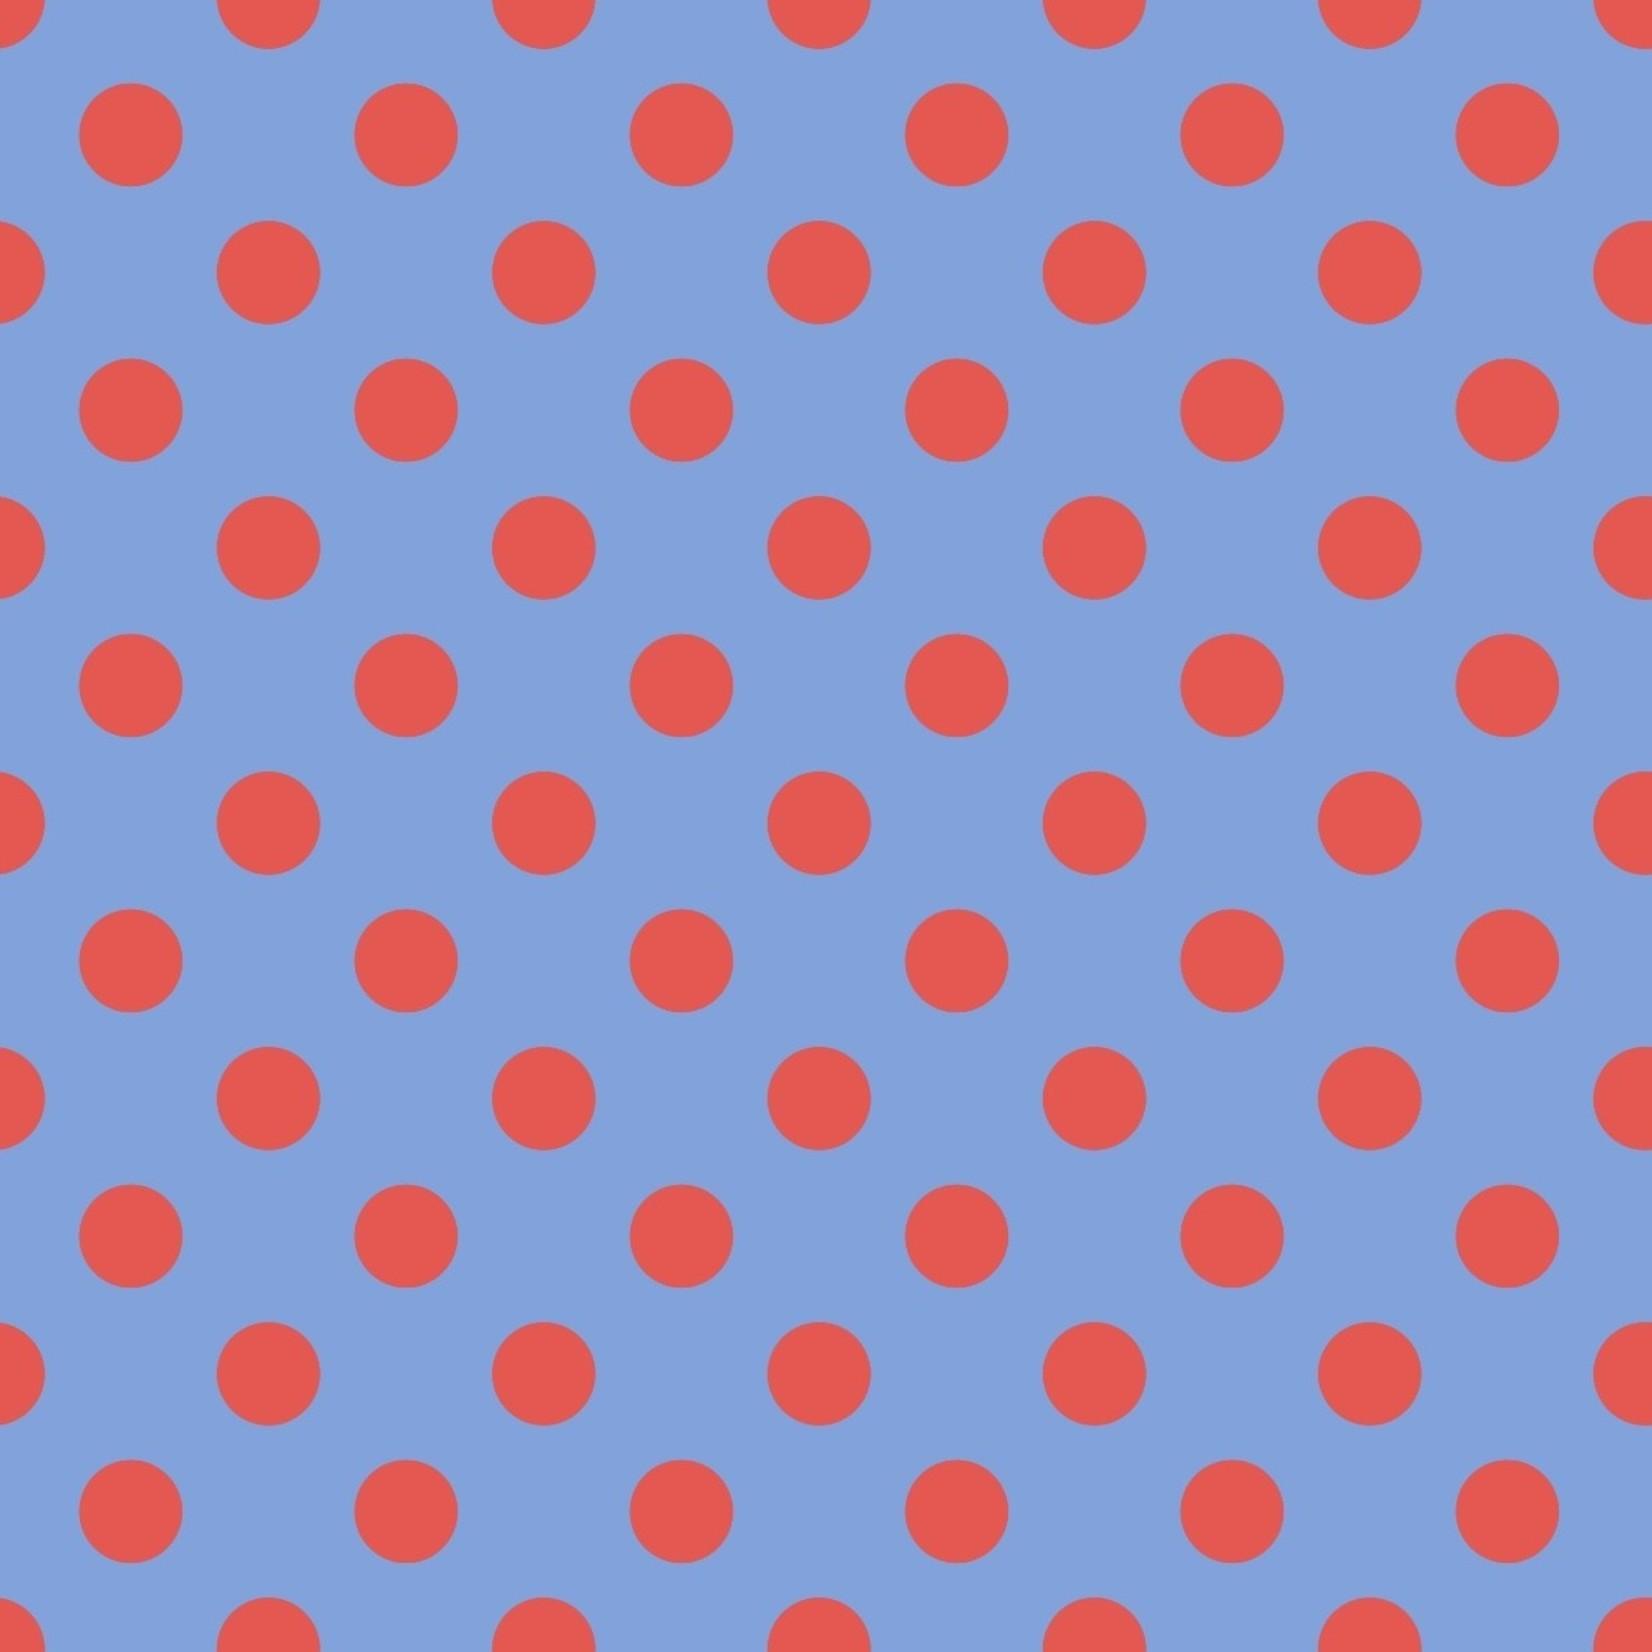 Tula Pink Tula Pom Poms- Lupine 0.17 per cm or $17/m